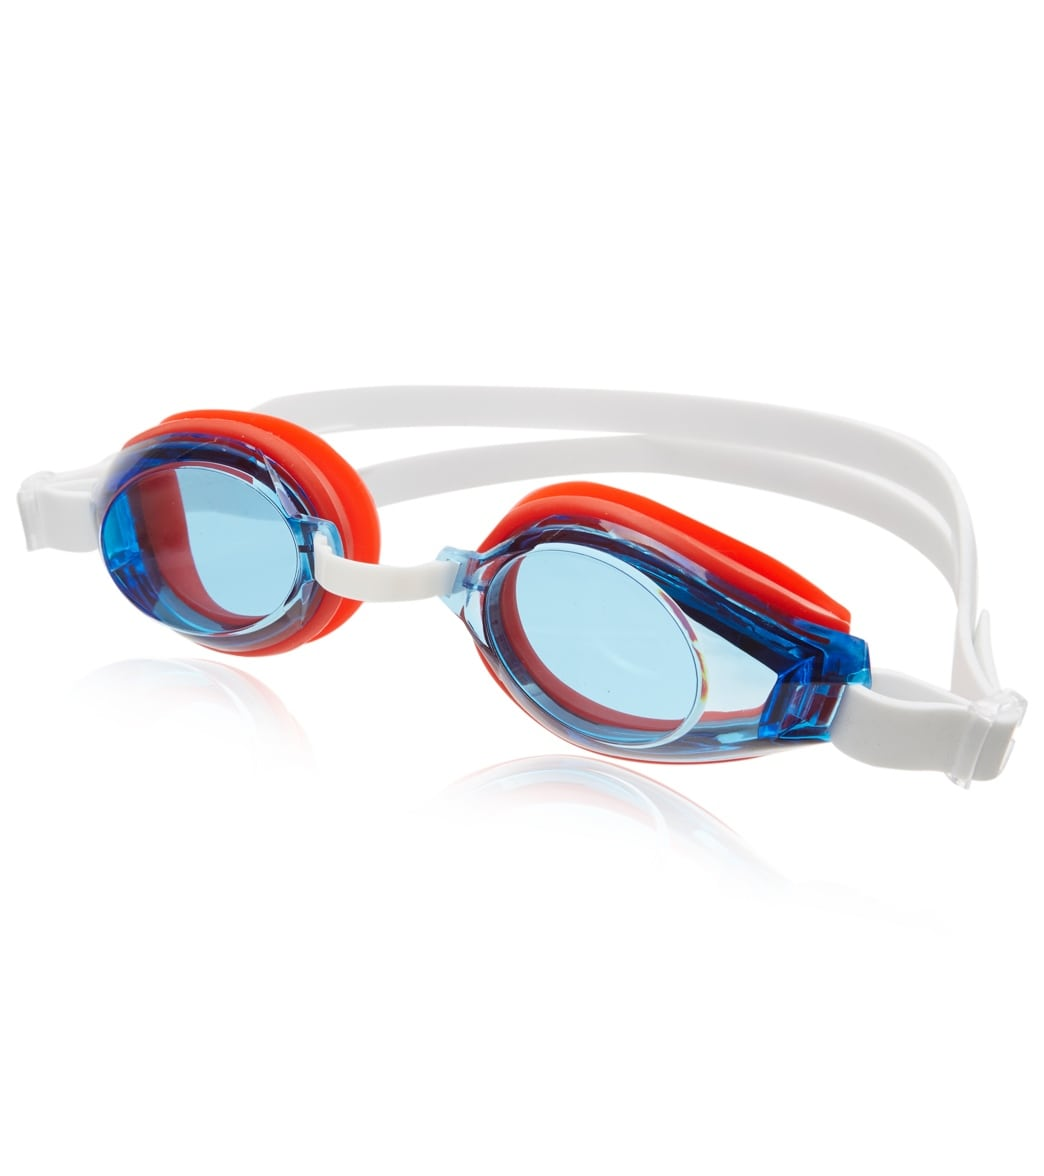 dcad8db12f9 USMS Antifog Plus Goggle at SwimOutlet.com